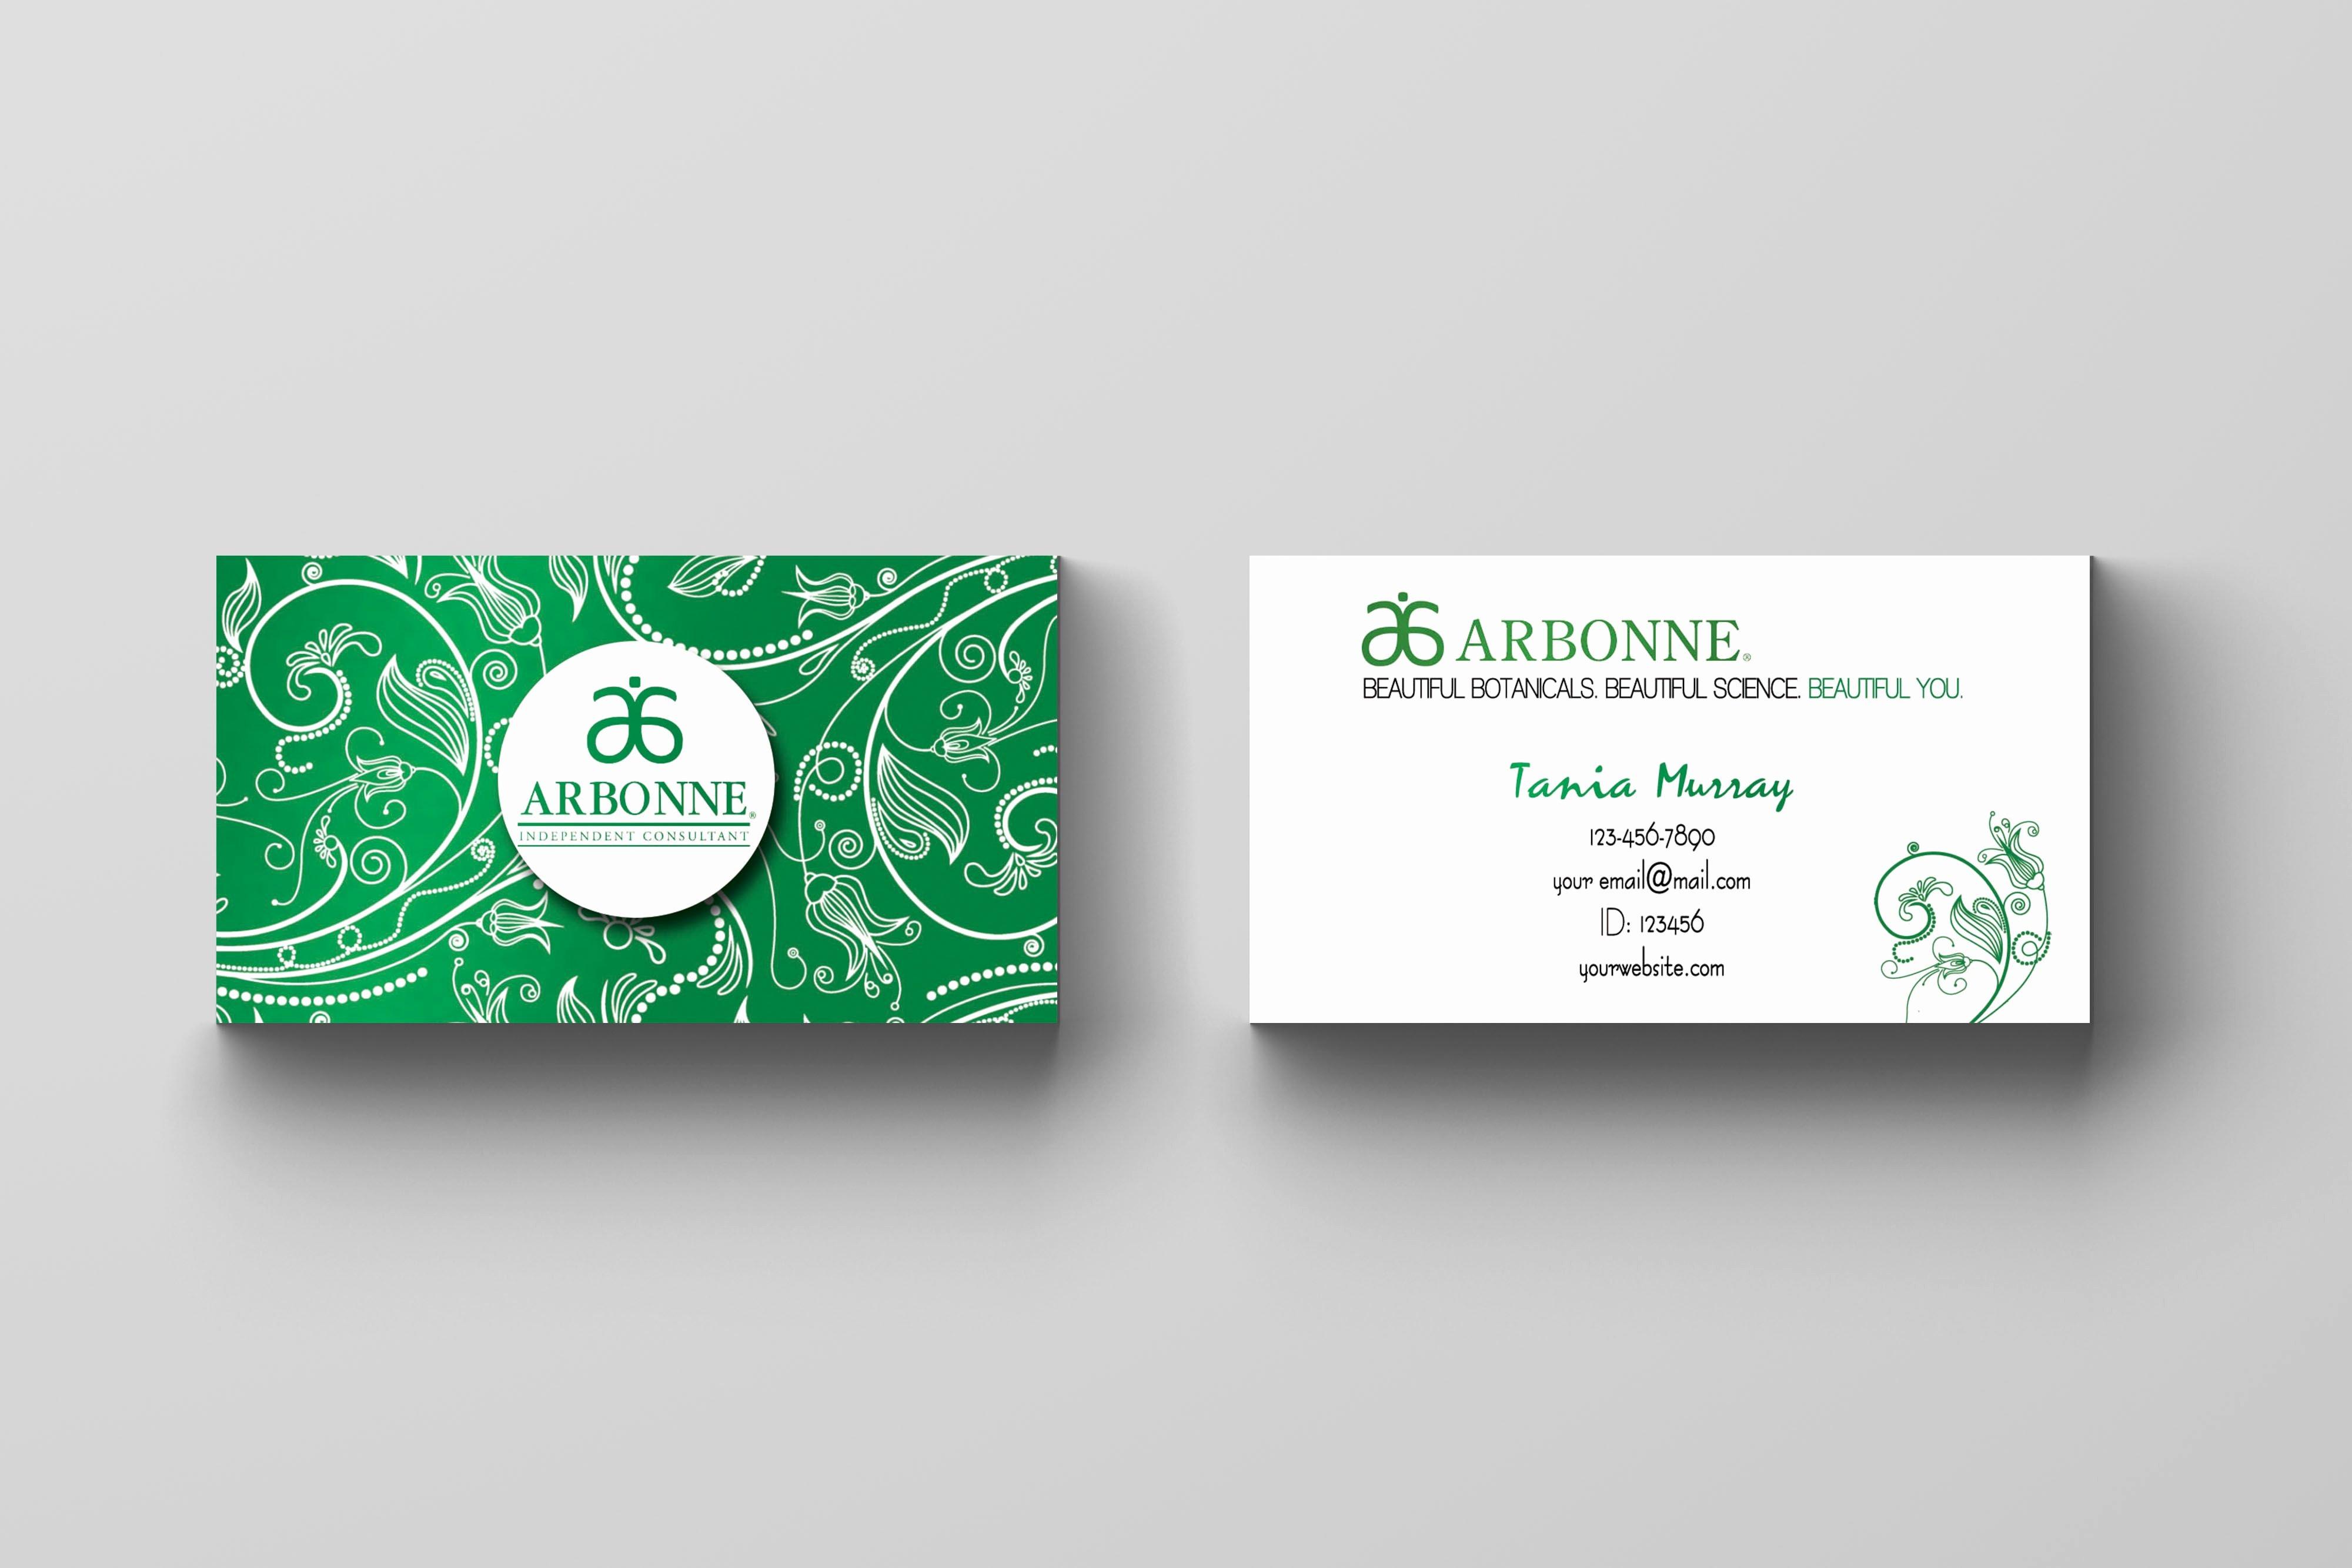 Arbonne Business Cards Template Elegant Arbonne Business Card Floral Green